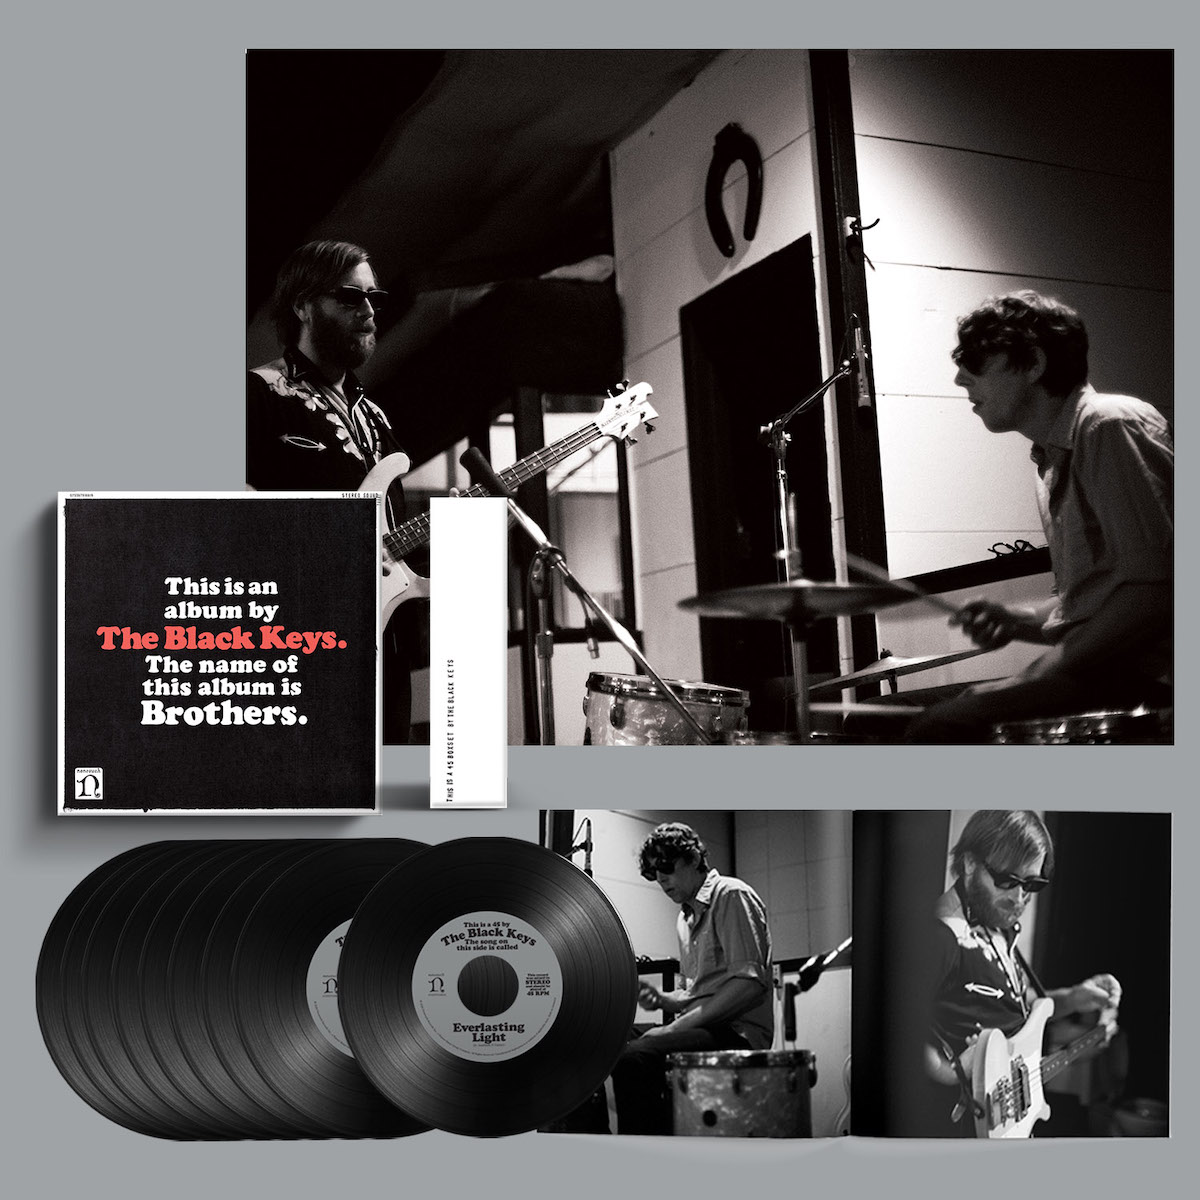 black keys brothers 10th anniversary deluxe reissue 7-inch box set vinyl